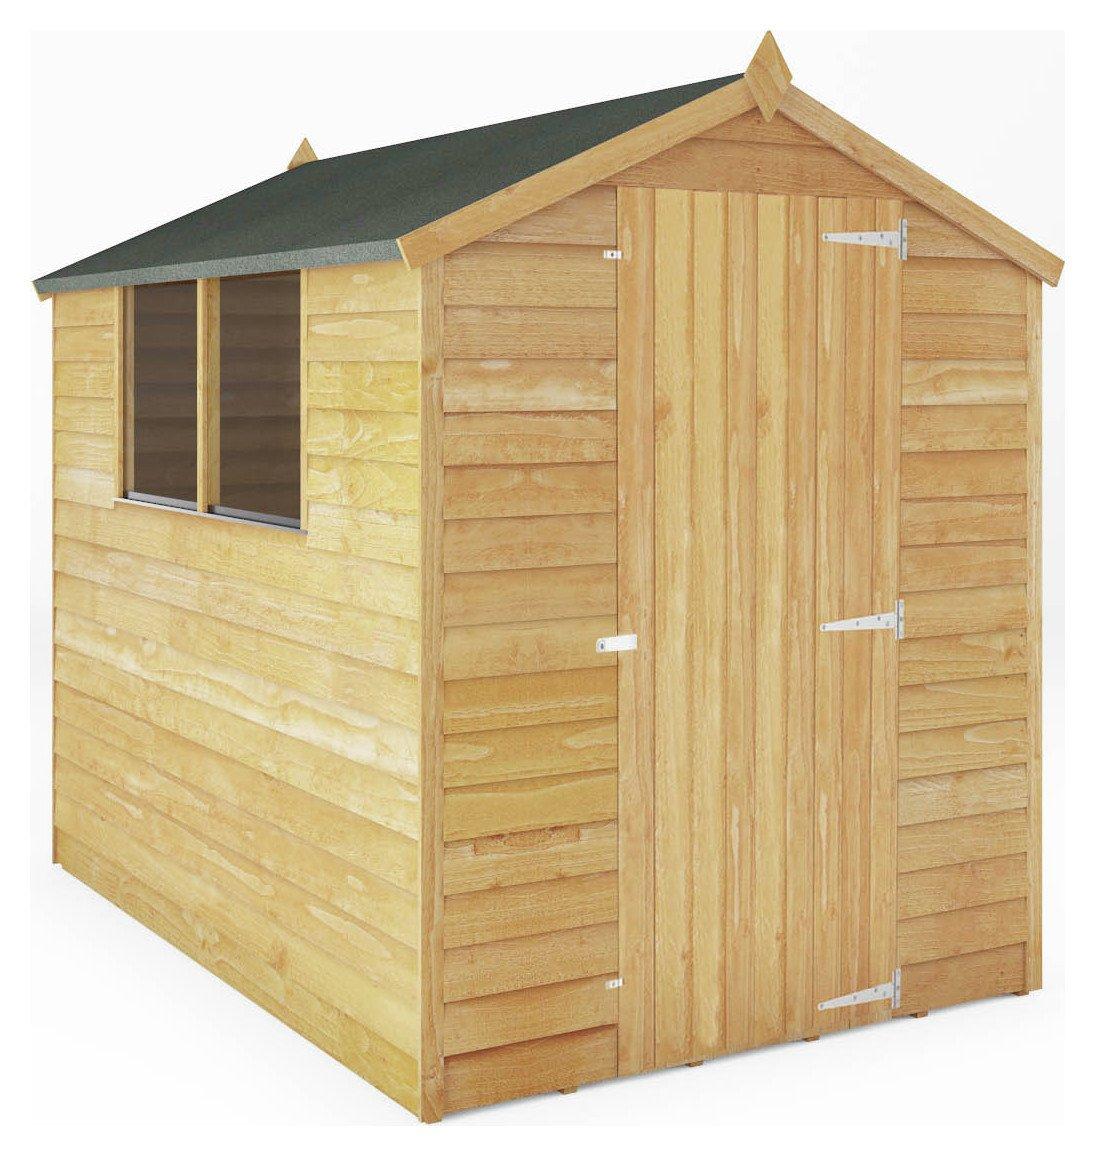 Garden Sheds Argos buy mercia overlap wooden garden shed - 7 x 5ft at argos.co.uk